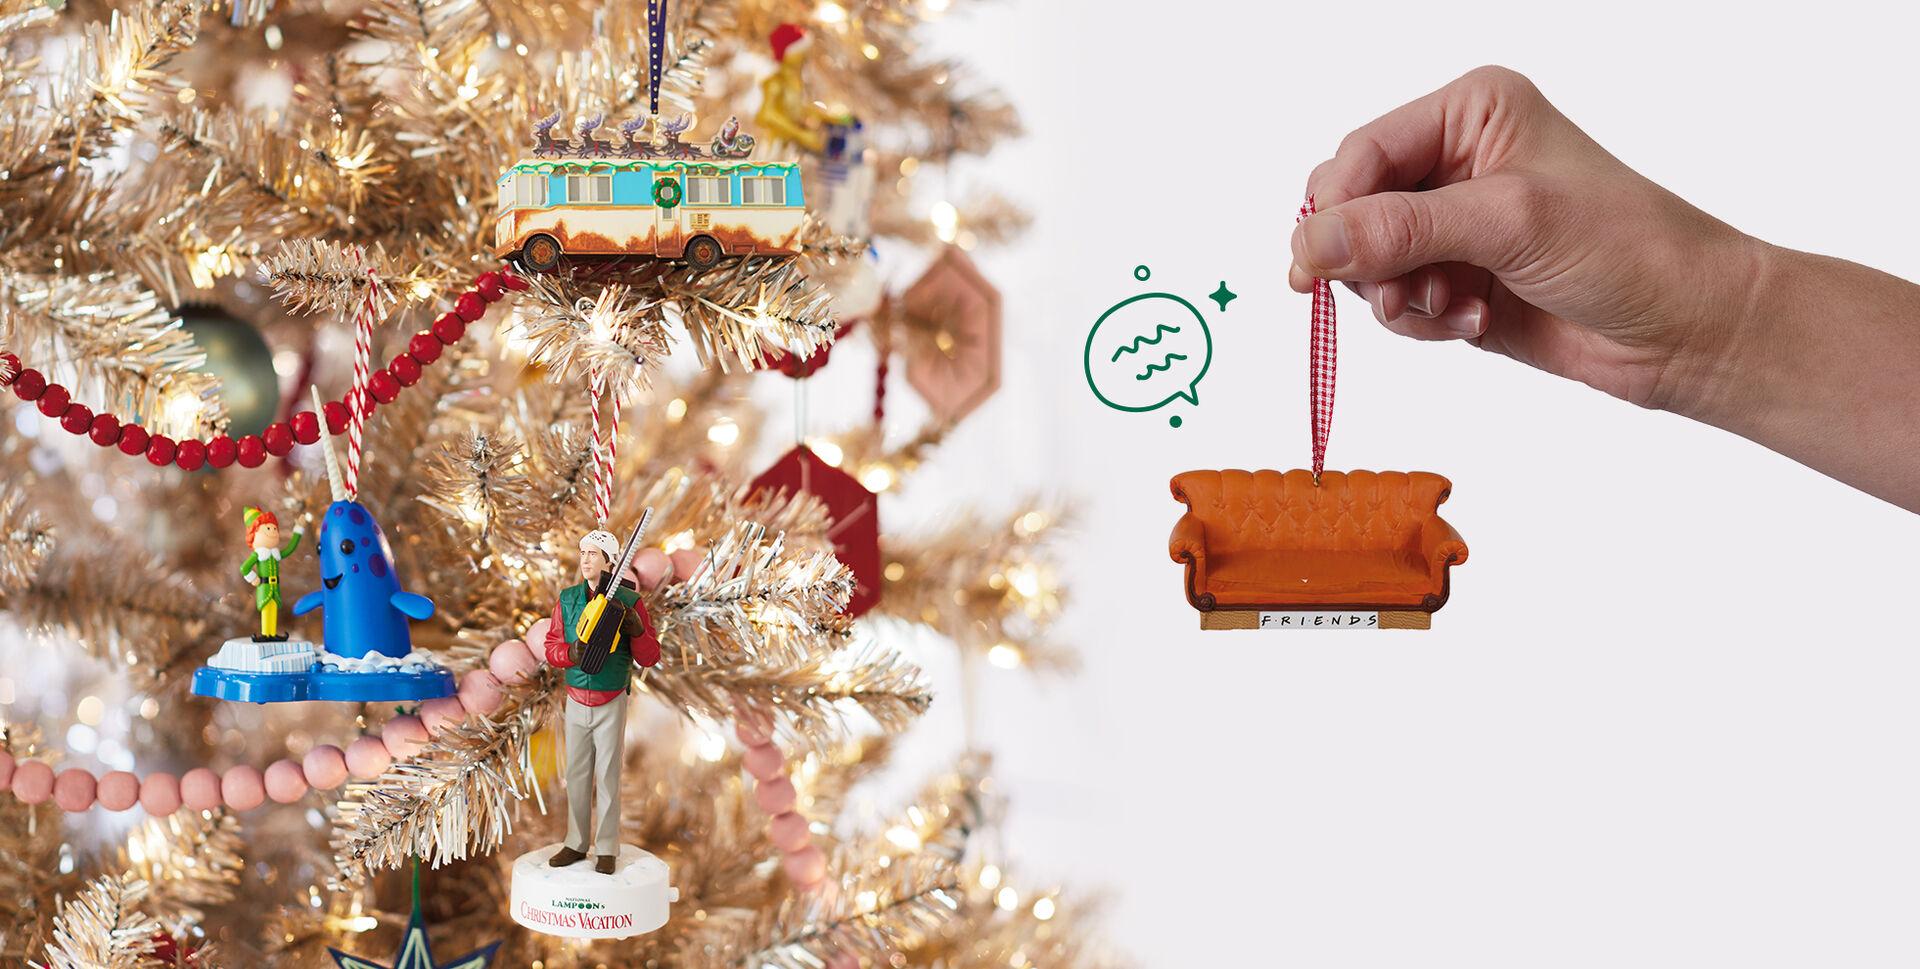 Hallmark Keepsake Christmas Ornament 2020 Hallmark Dream Book 2020 | Browse Keepsake Ornaments Online | Hallmark